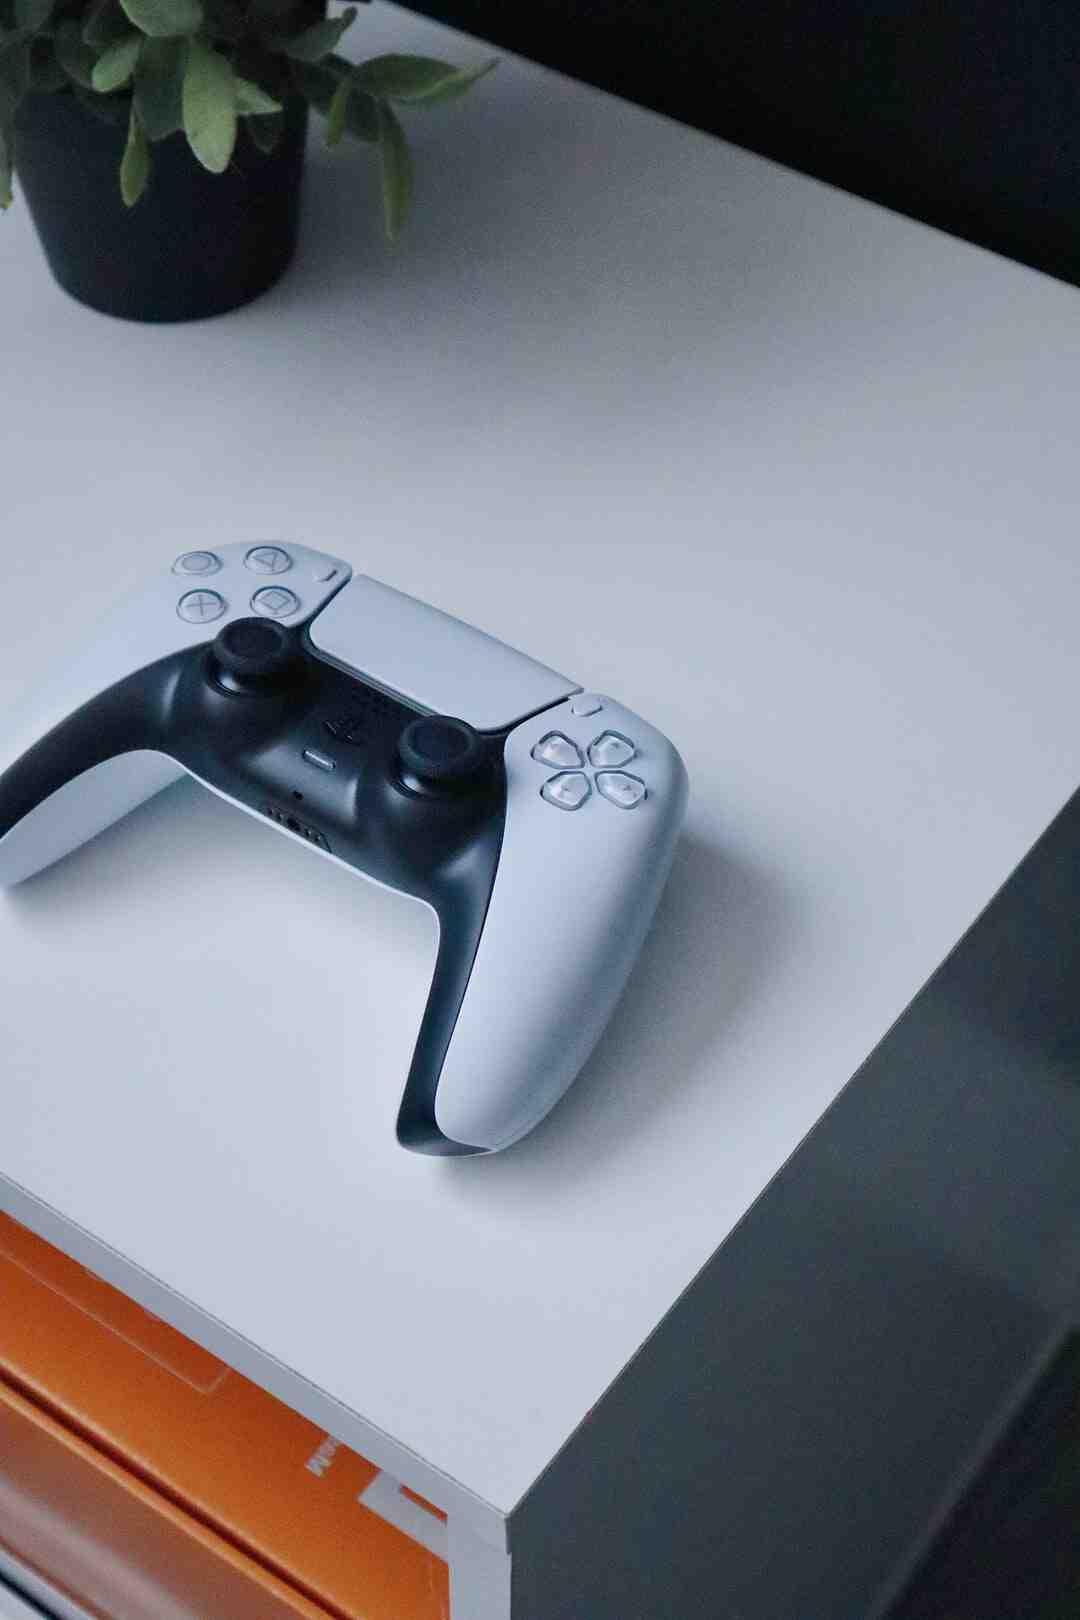 Où Peut-on acheter la PS5 ?